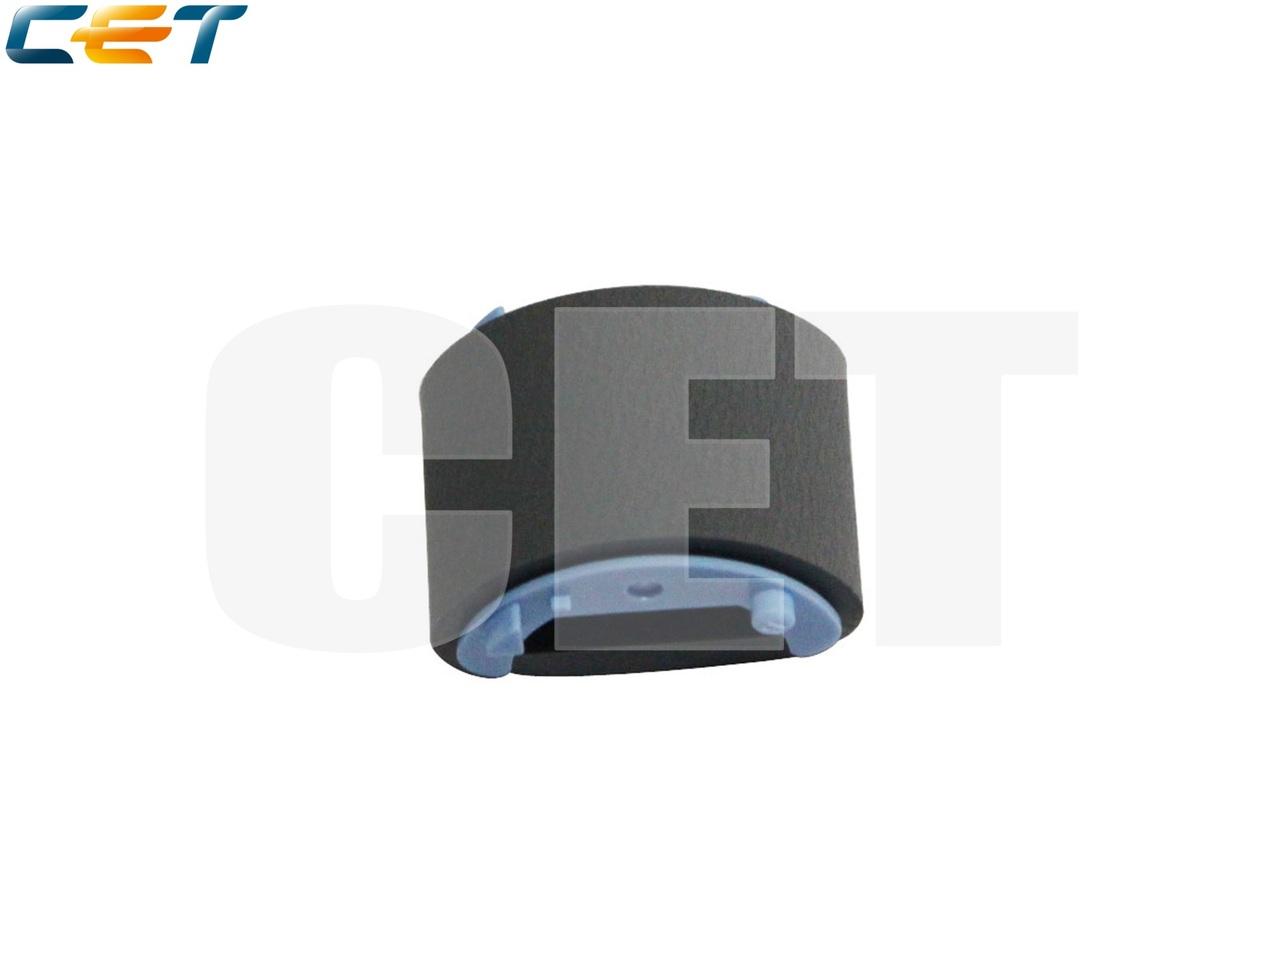 Ролик подхвата RL1-1497-000 для HP LaserJetP1505/M1522/P1606/M1536 (CET), CET4952, CET4952R